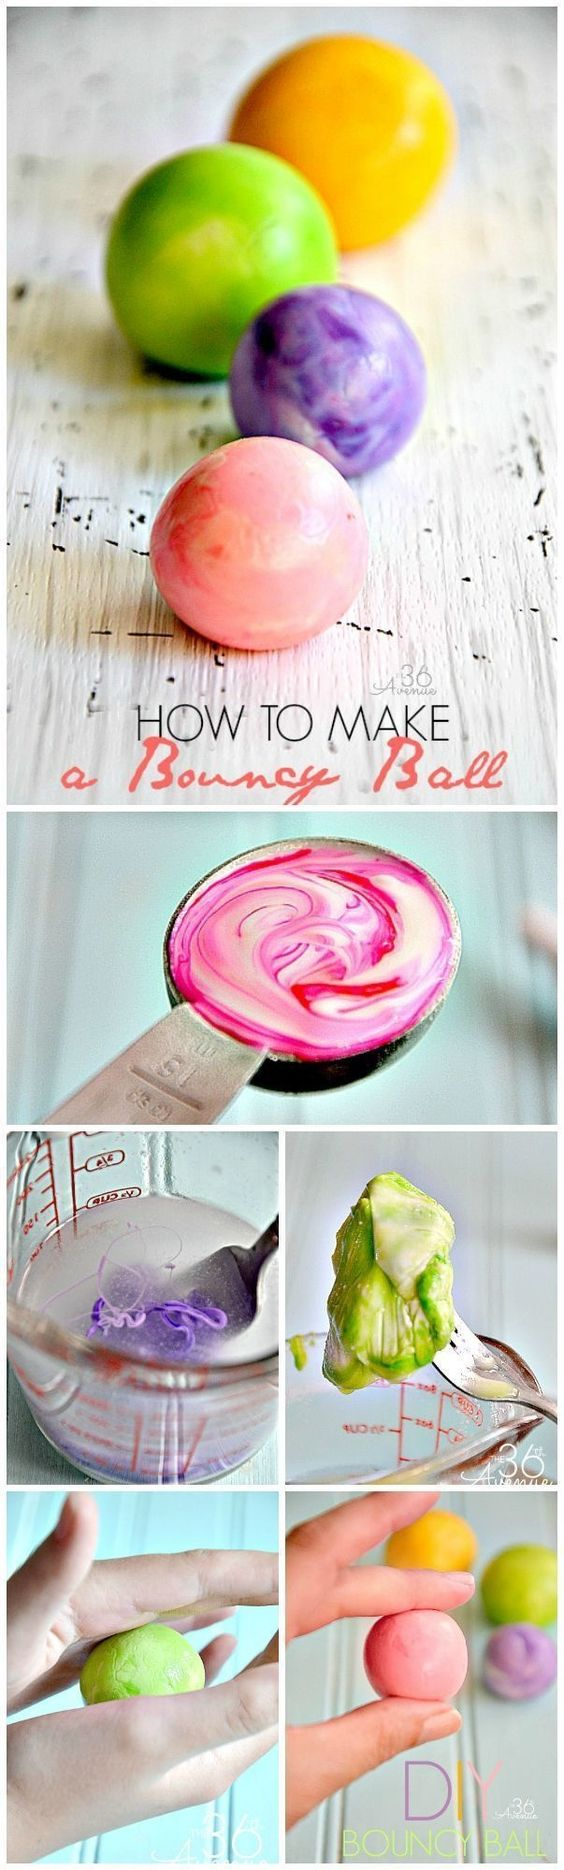 how to make homemade glue with cornstarch